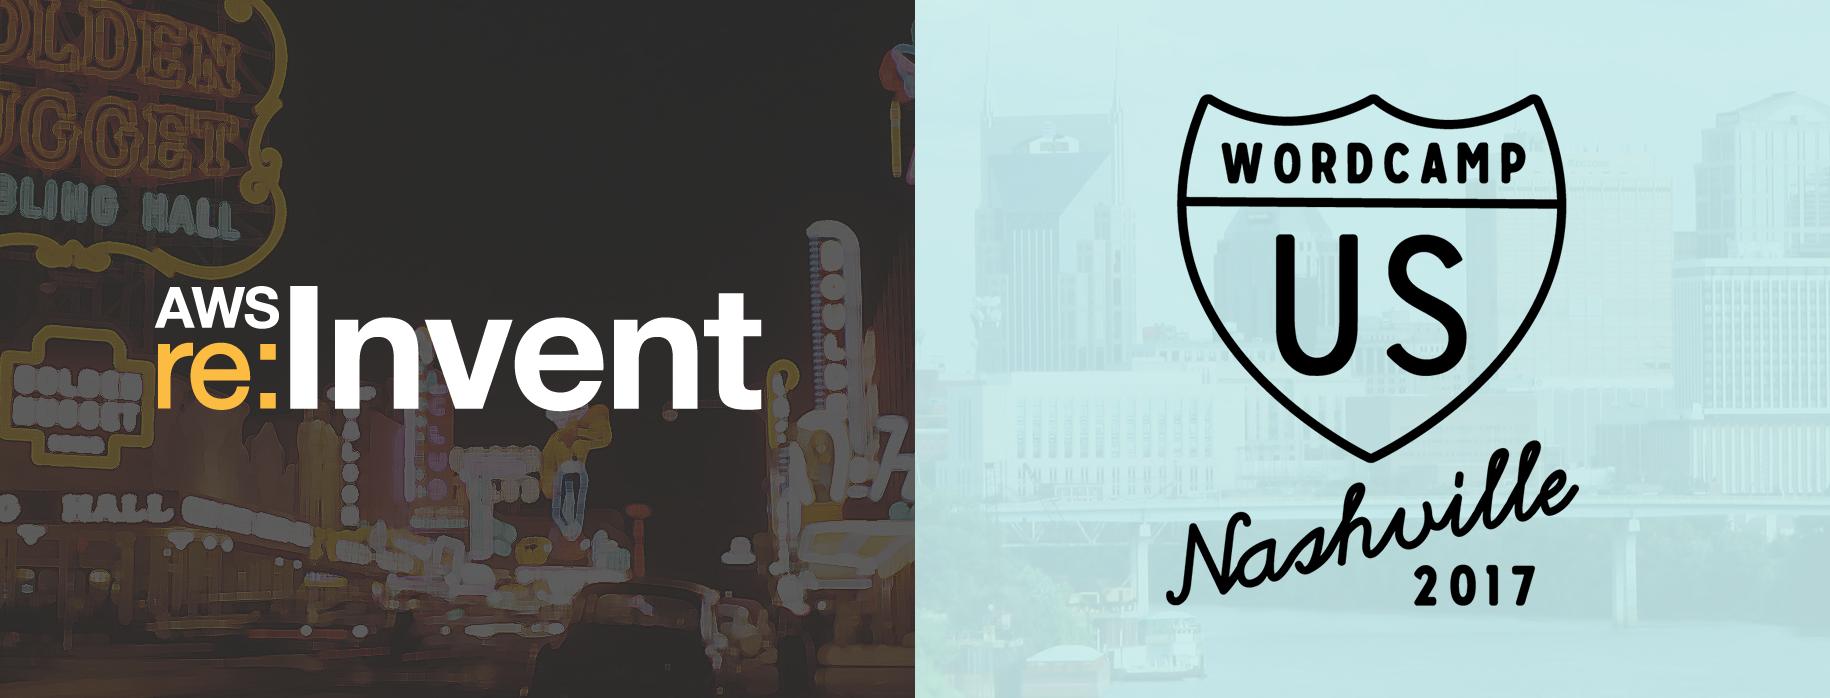 reInvent WordCamp Us 2017